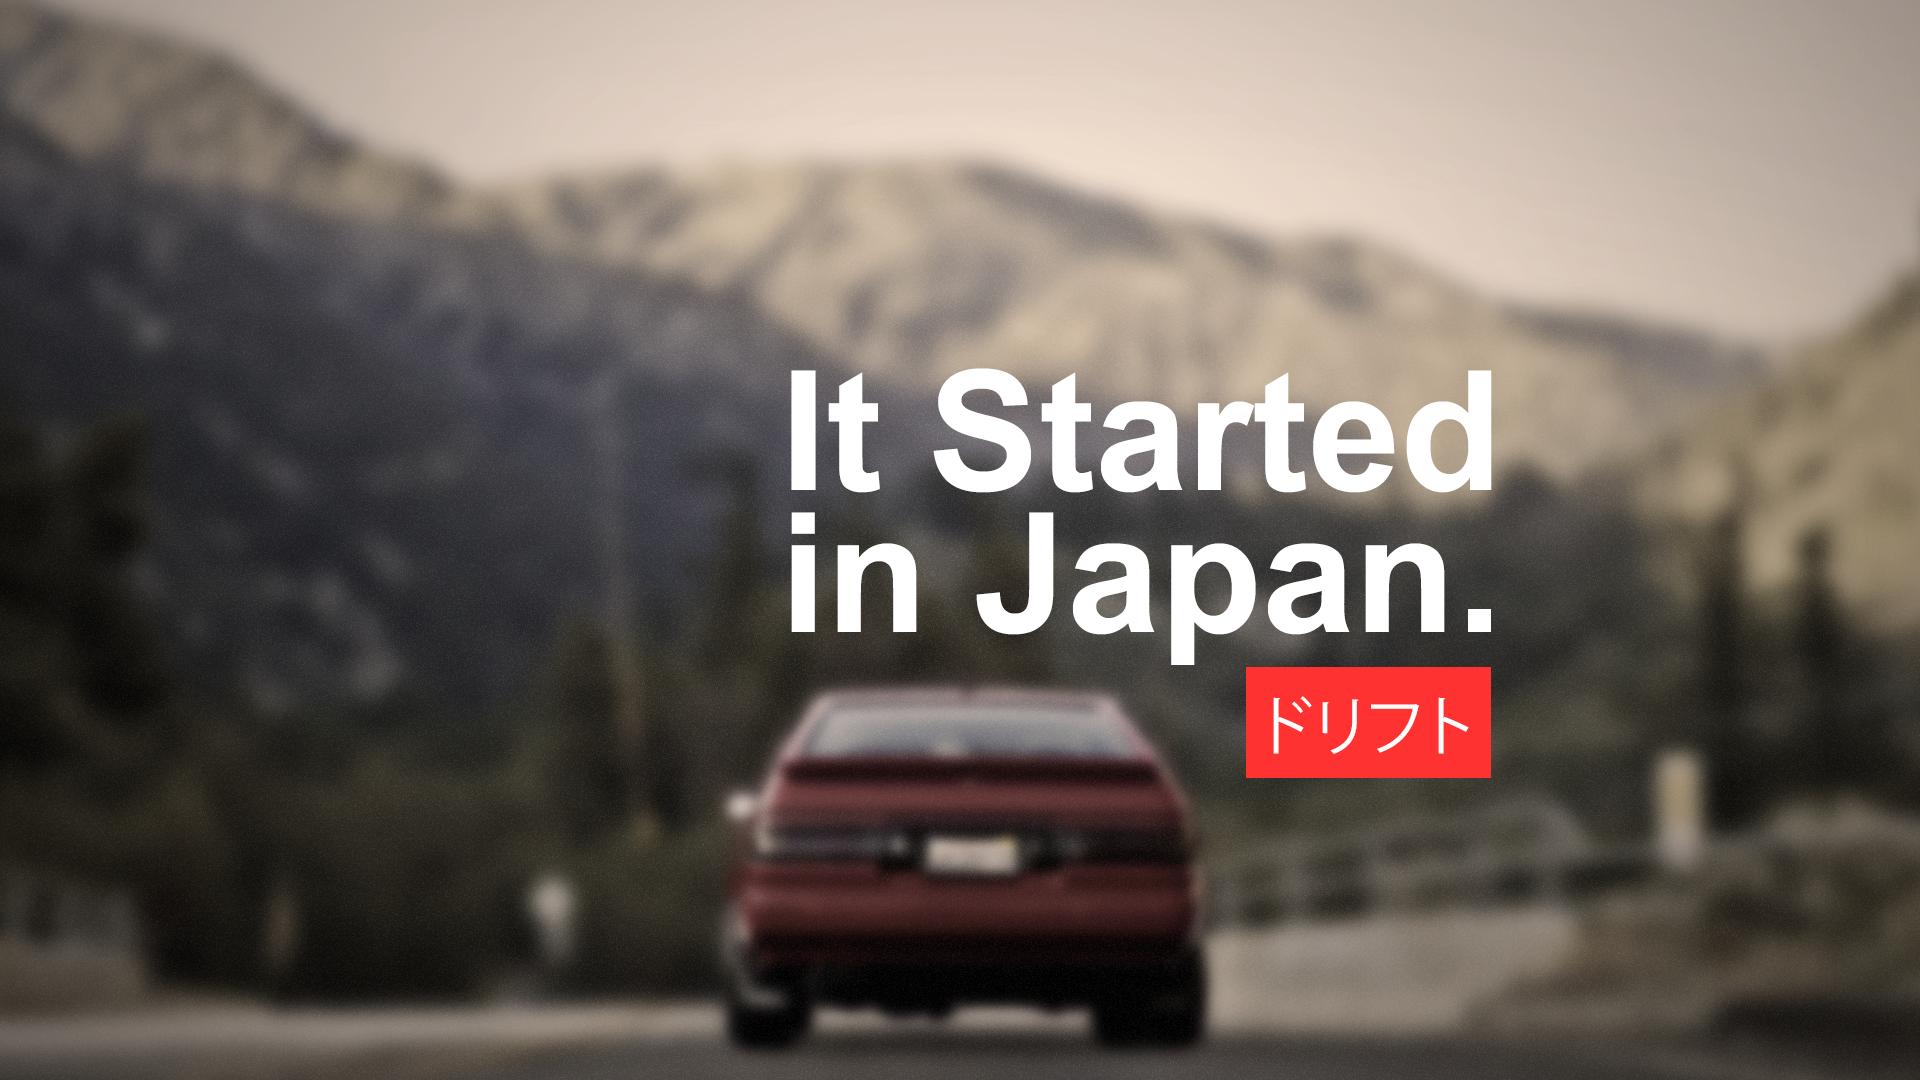 Wallpaper Japanese Cars Car Vehicle Jdm Drifting